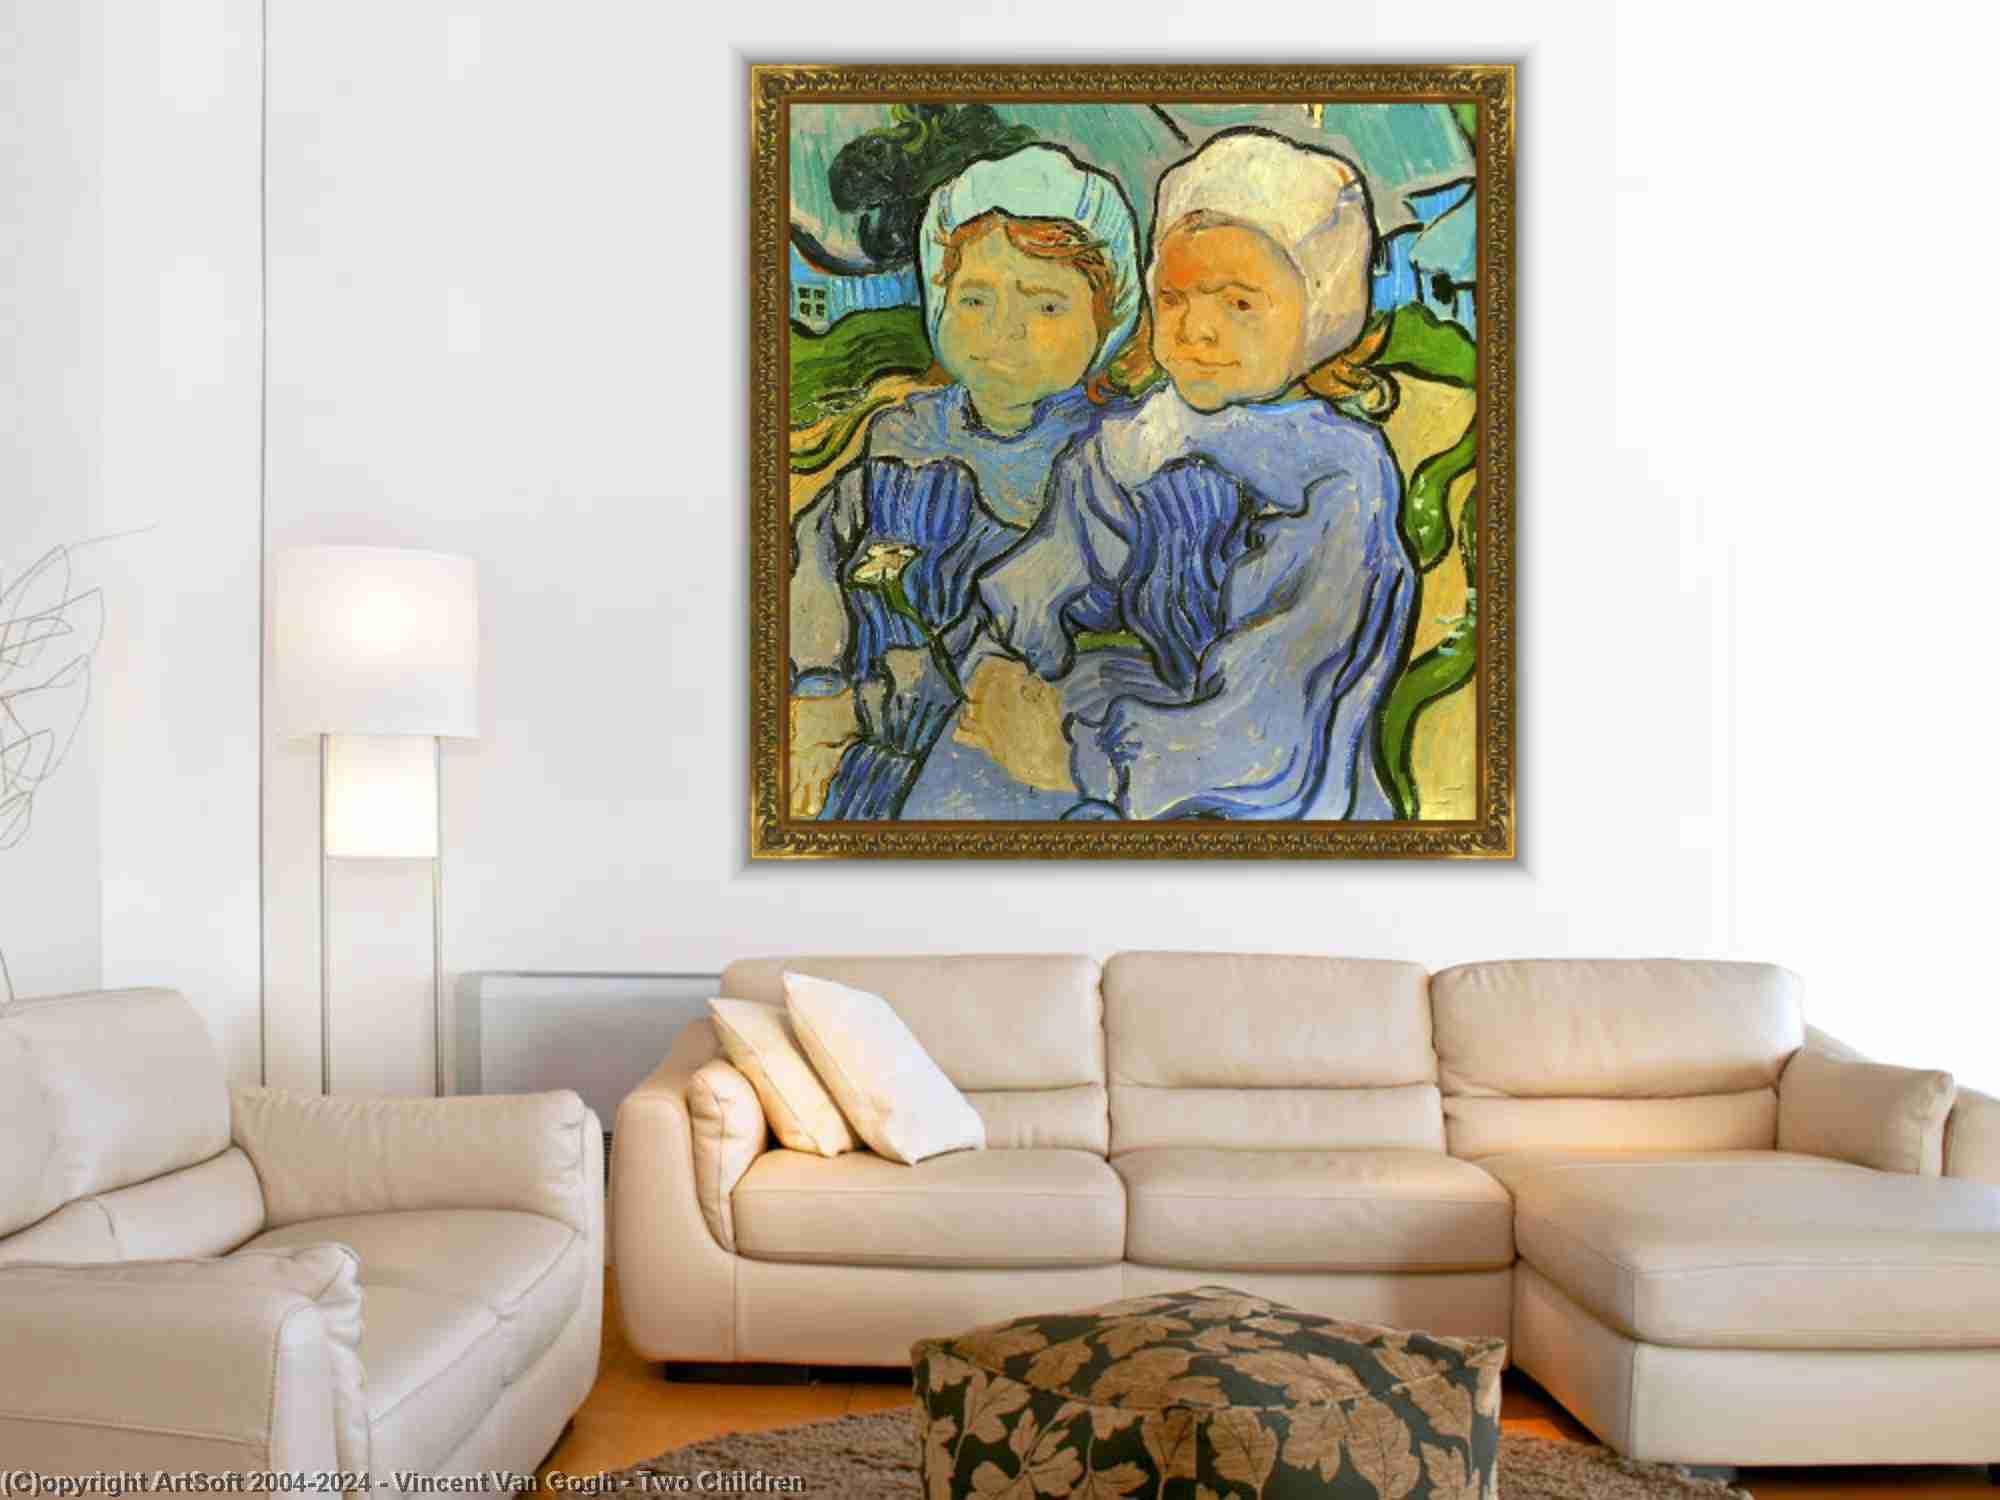 Vincent Van Gogh - zwei kinder